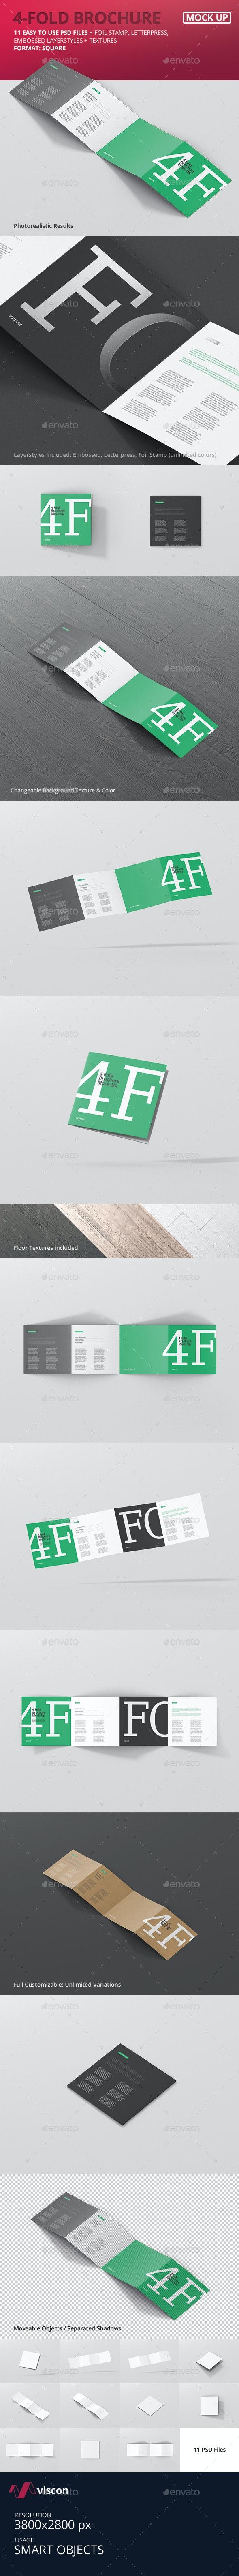 4-Fold Brochure Mockup - Square - Brochures Print